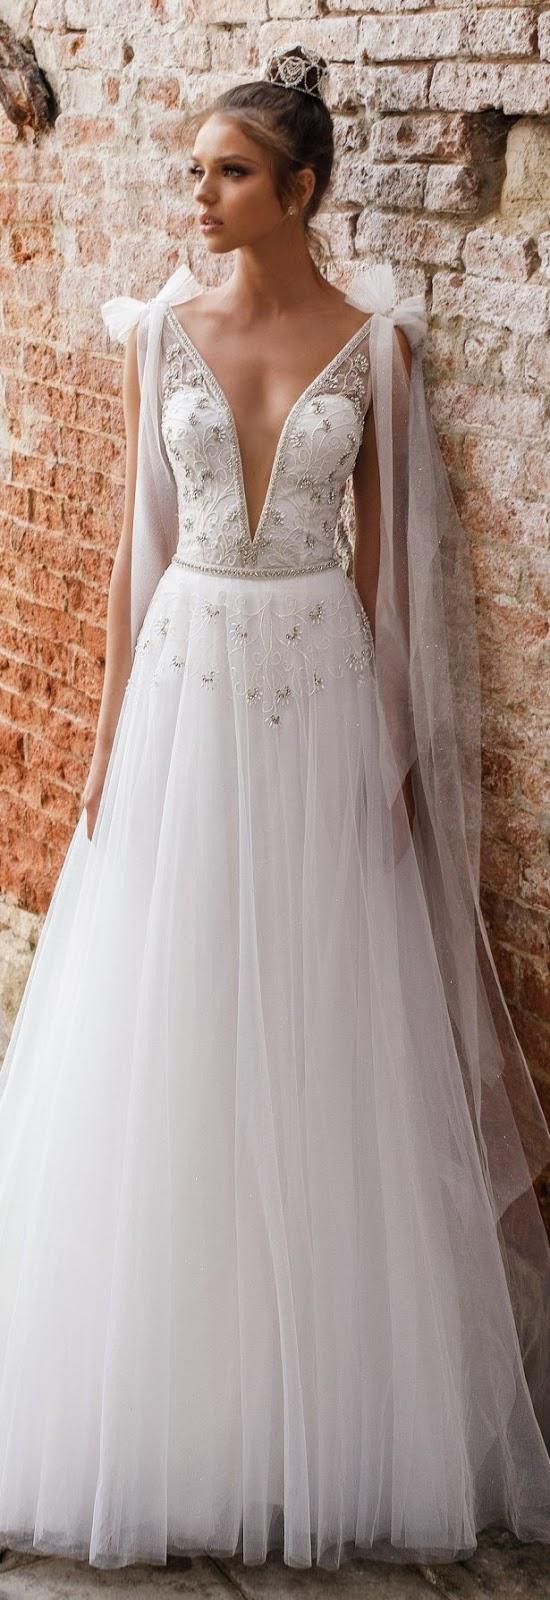 #Wedding #Dresses Amazing Wedding Dresses